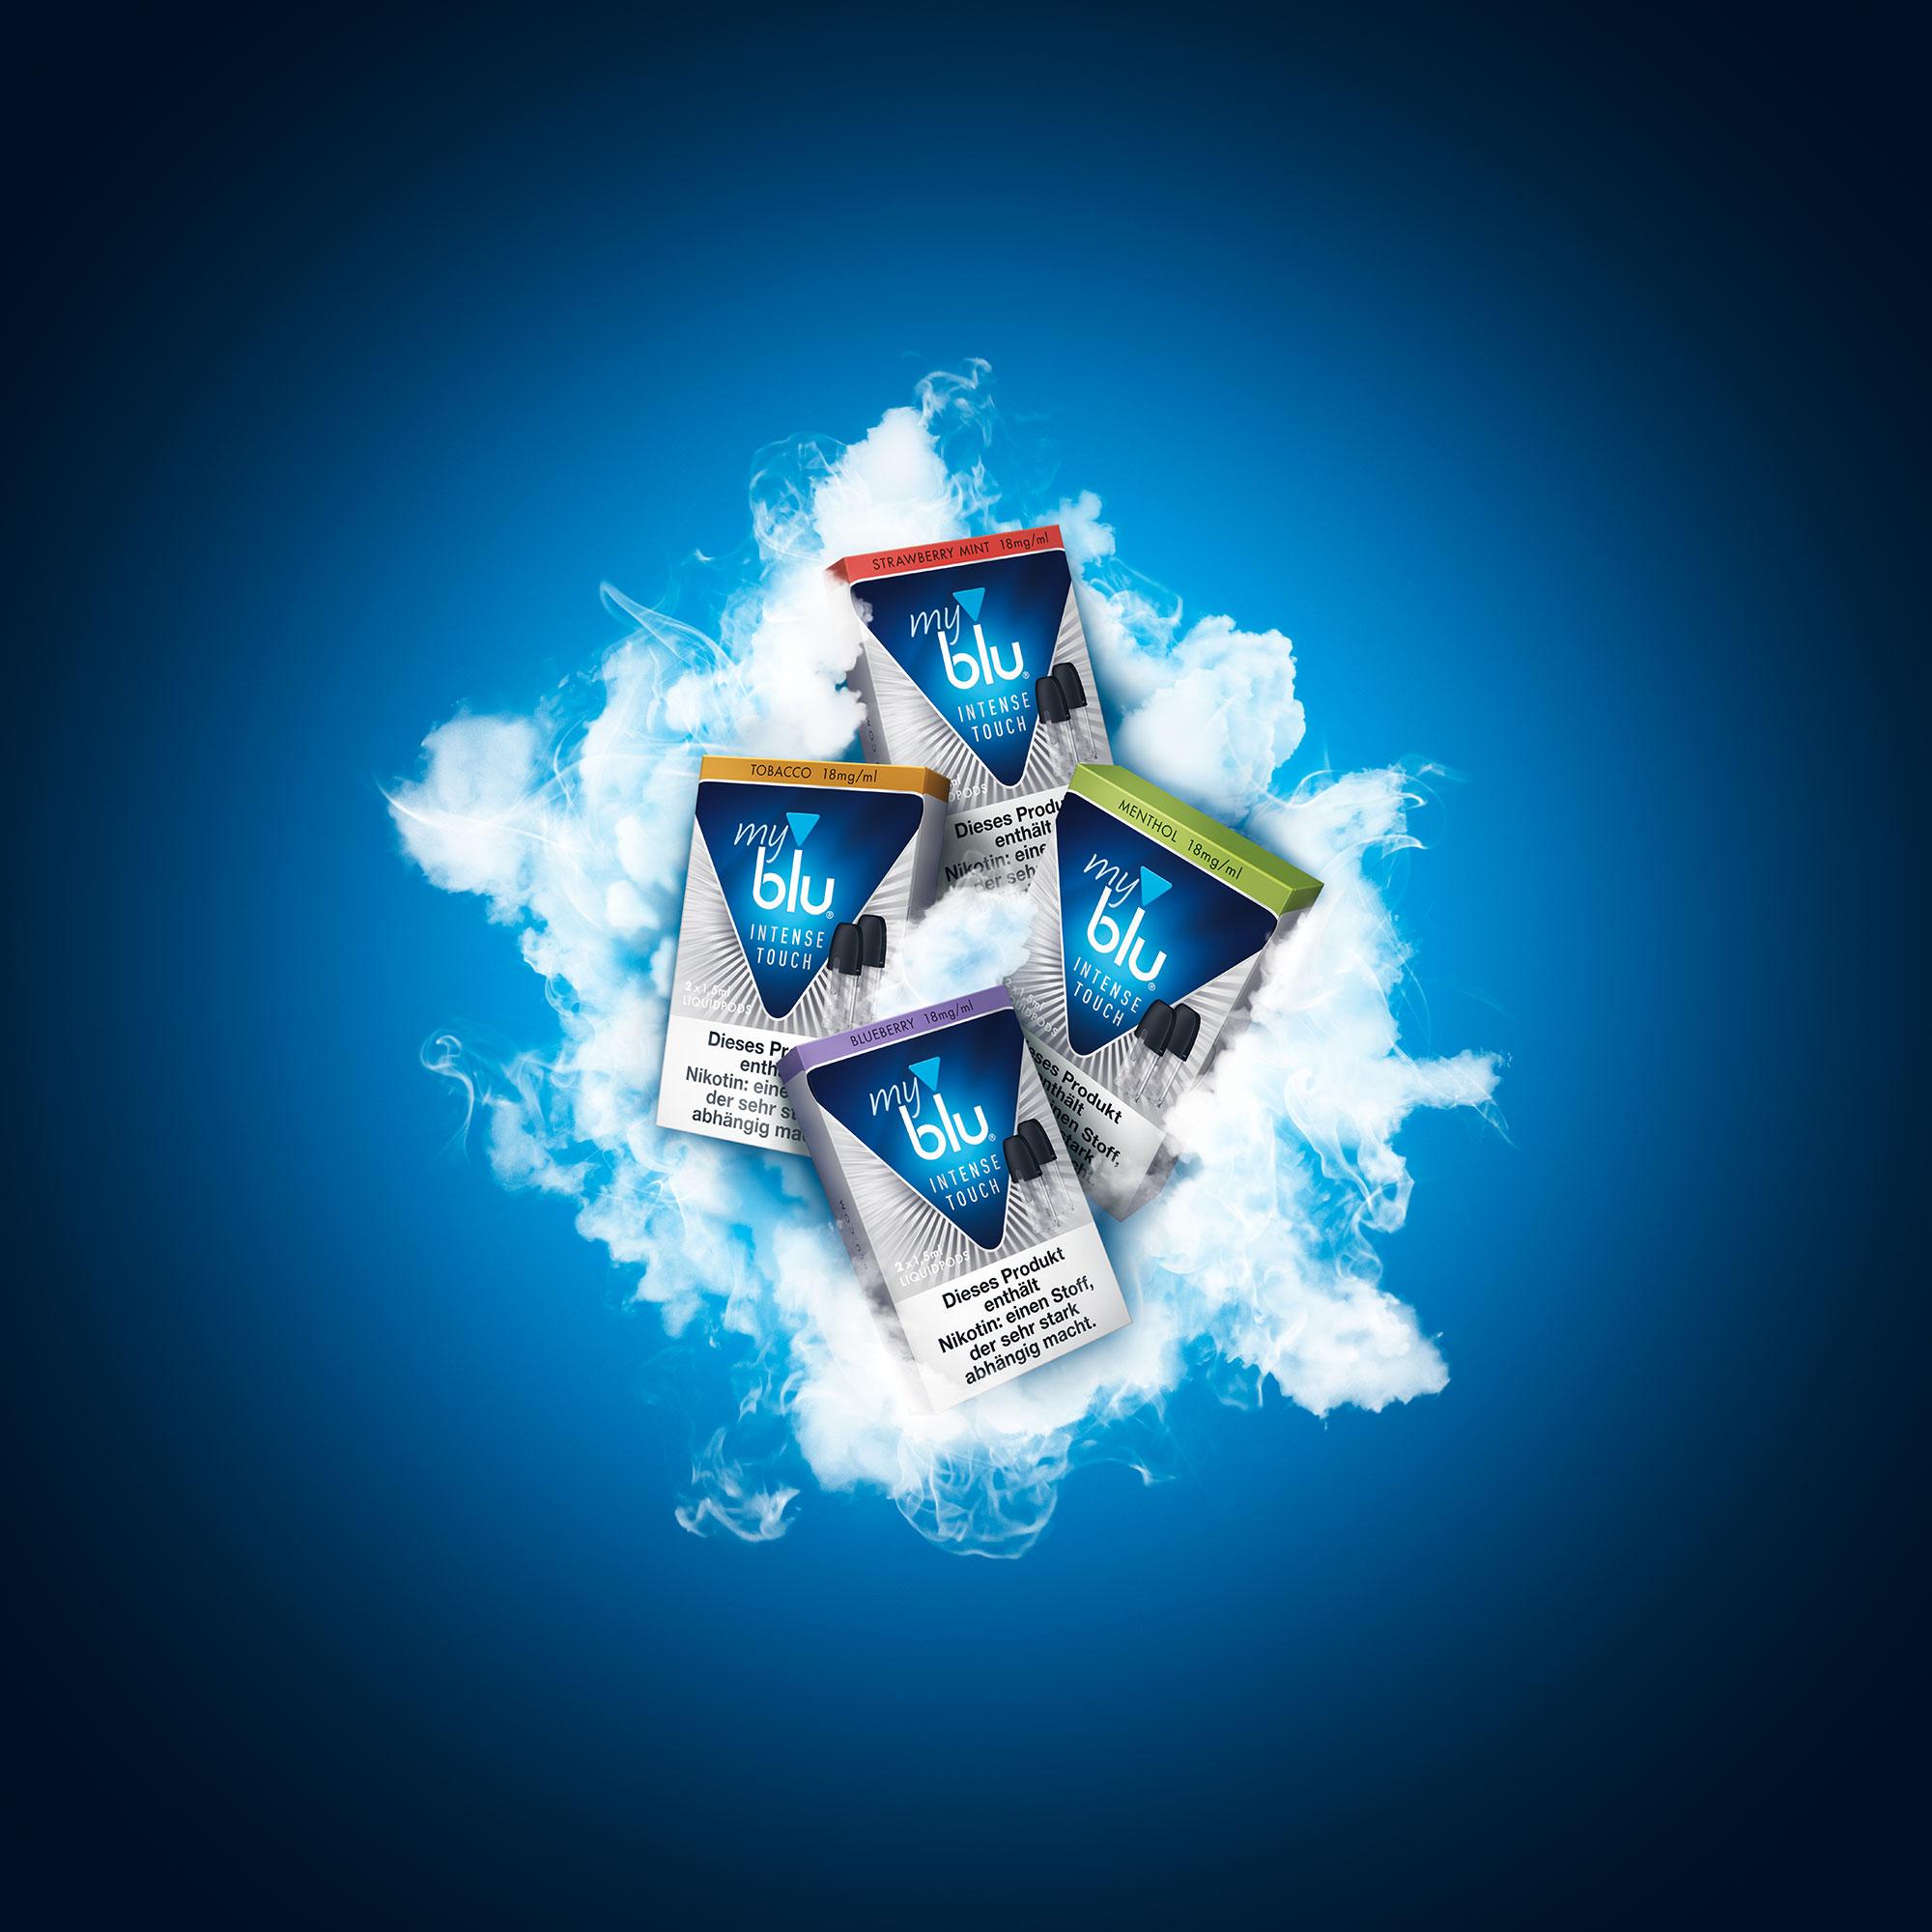 Blu-KeyVisual